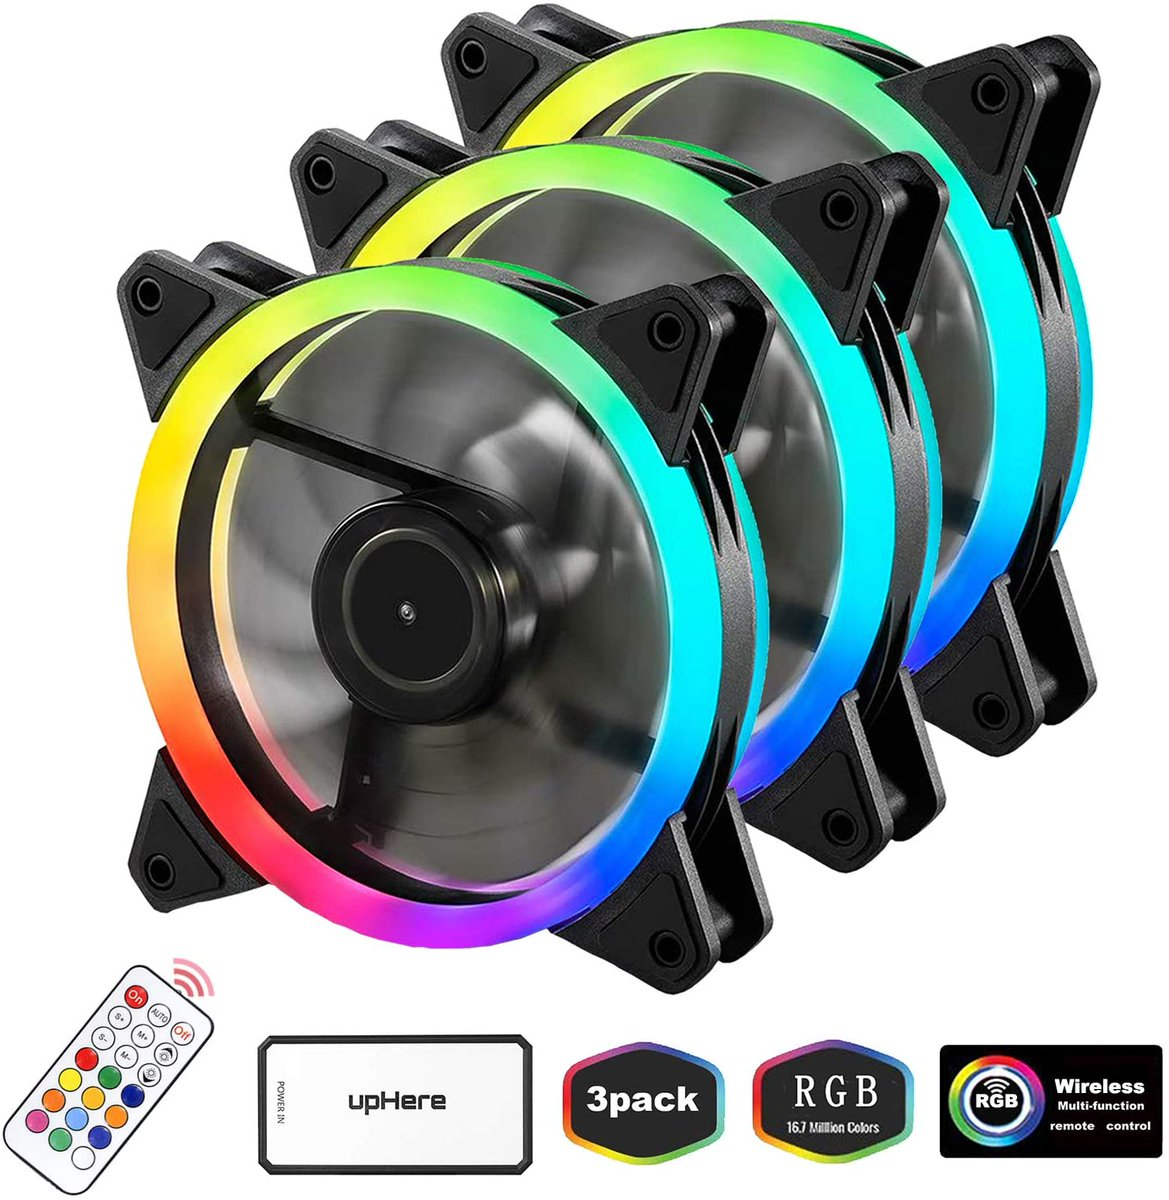 upHere 3-Pack Wireless RGB LED 120mm Case Fan  Only $23.99!